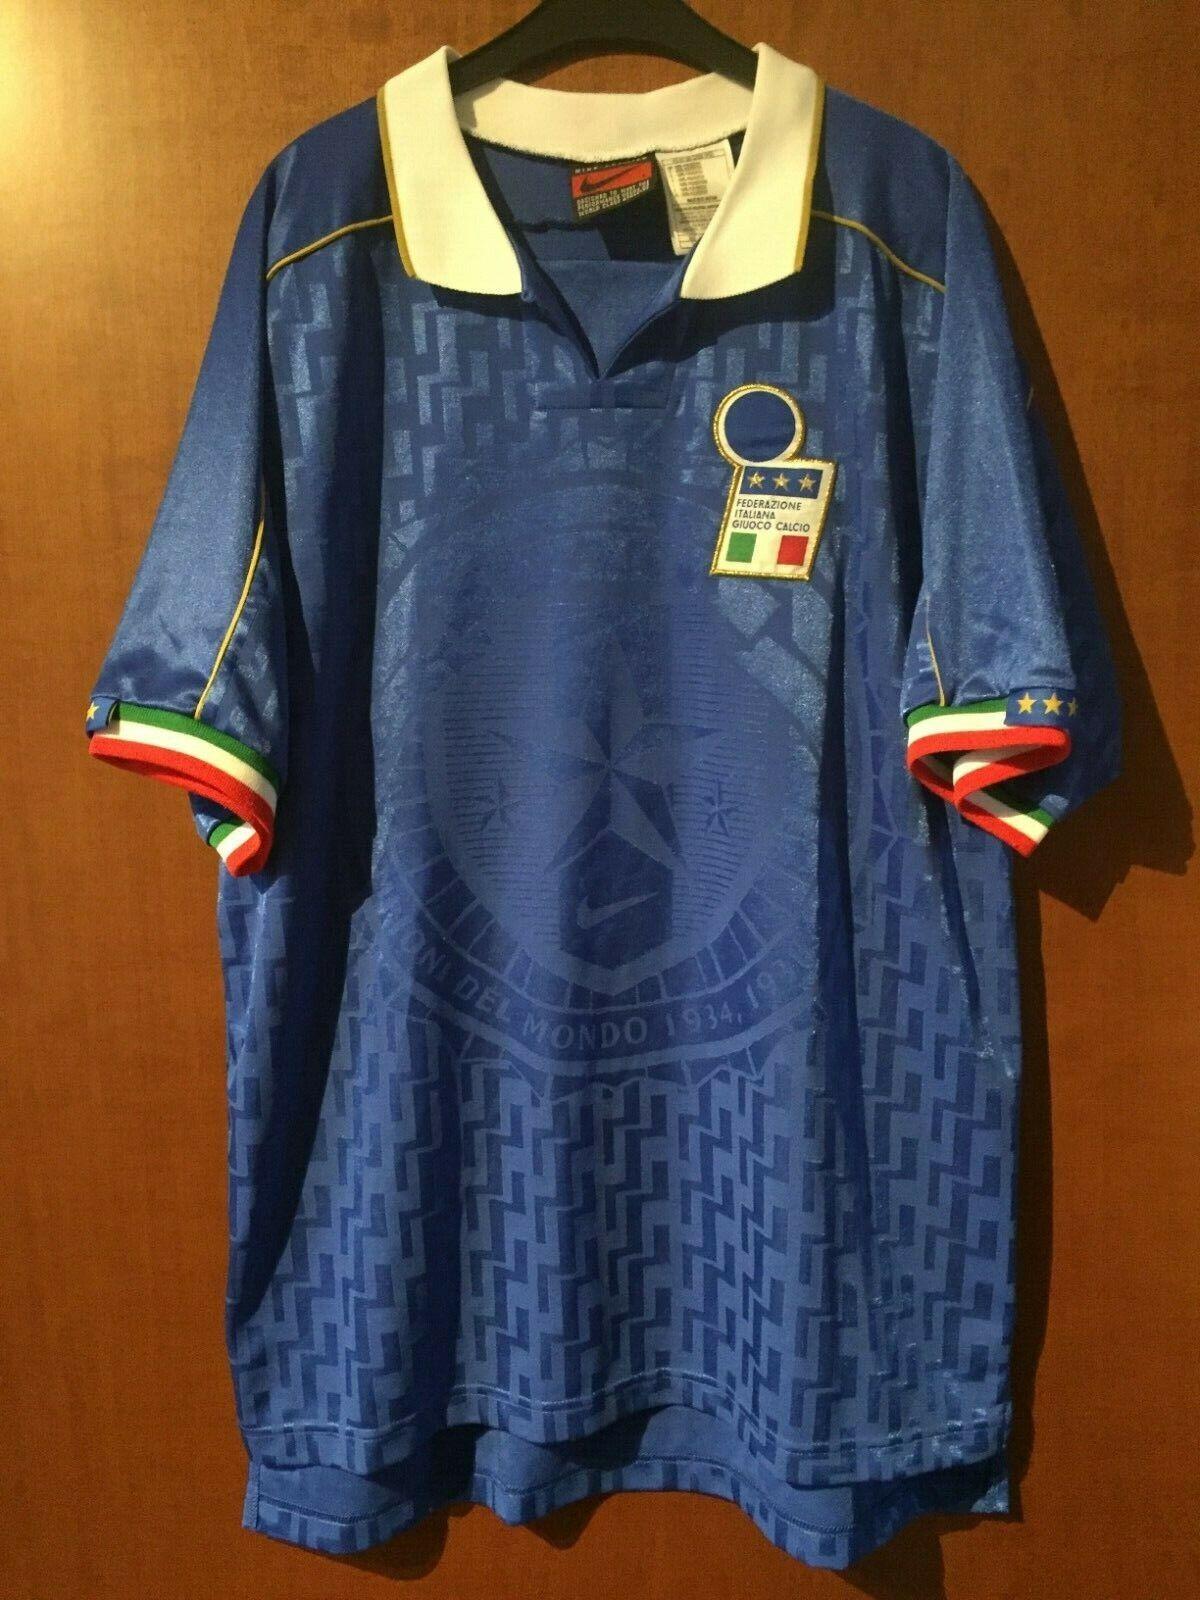 Maglia Shirt Maillot Trikot Camiseta Italia  Match Worn Di Matteo Albertini